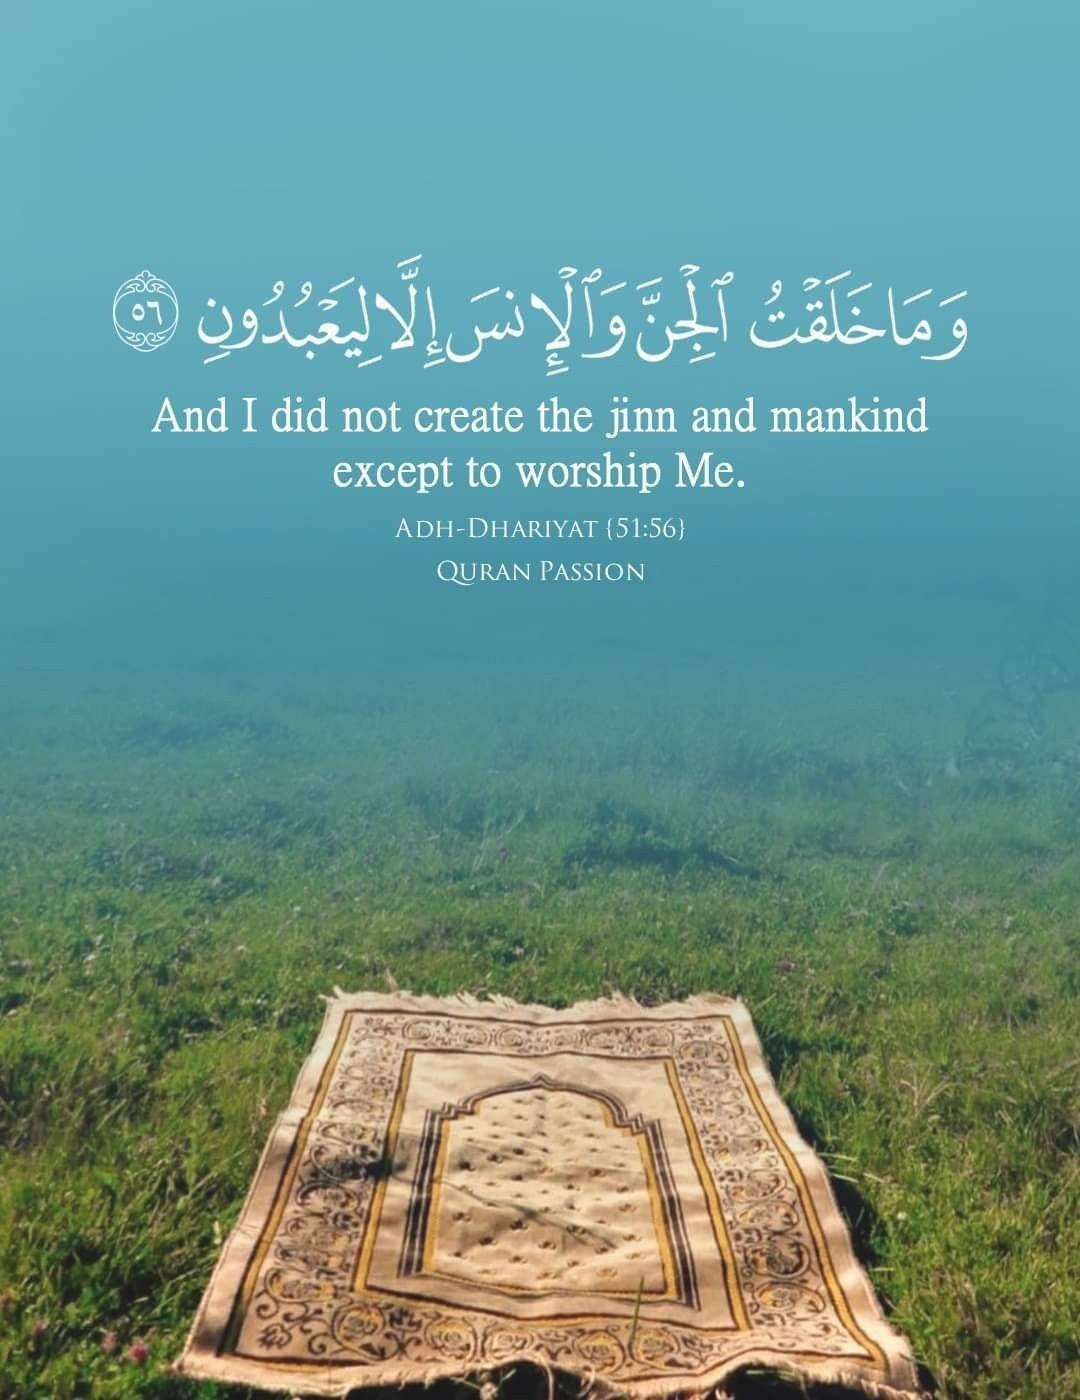 Pin By Zino On My Din Islamic Quotes Hadeeth Islamic Videos